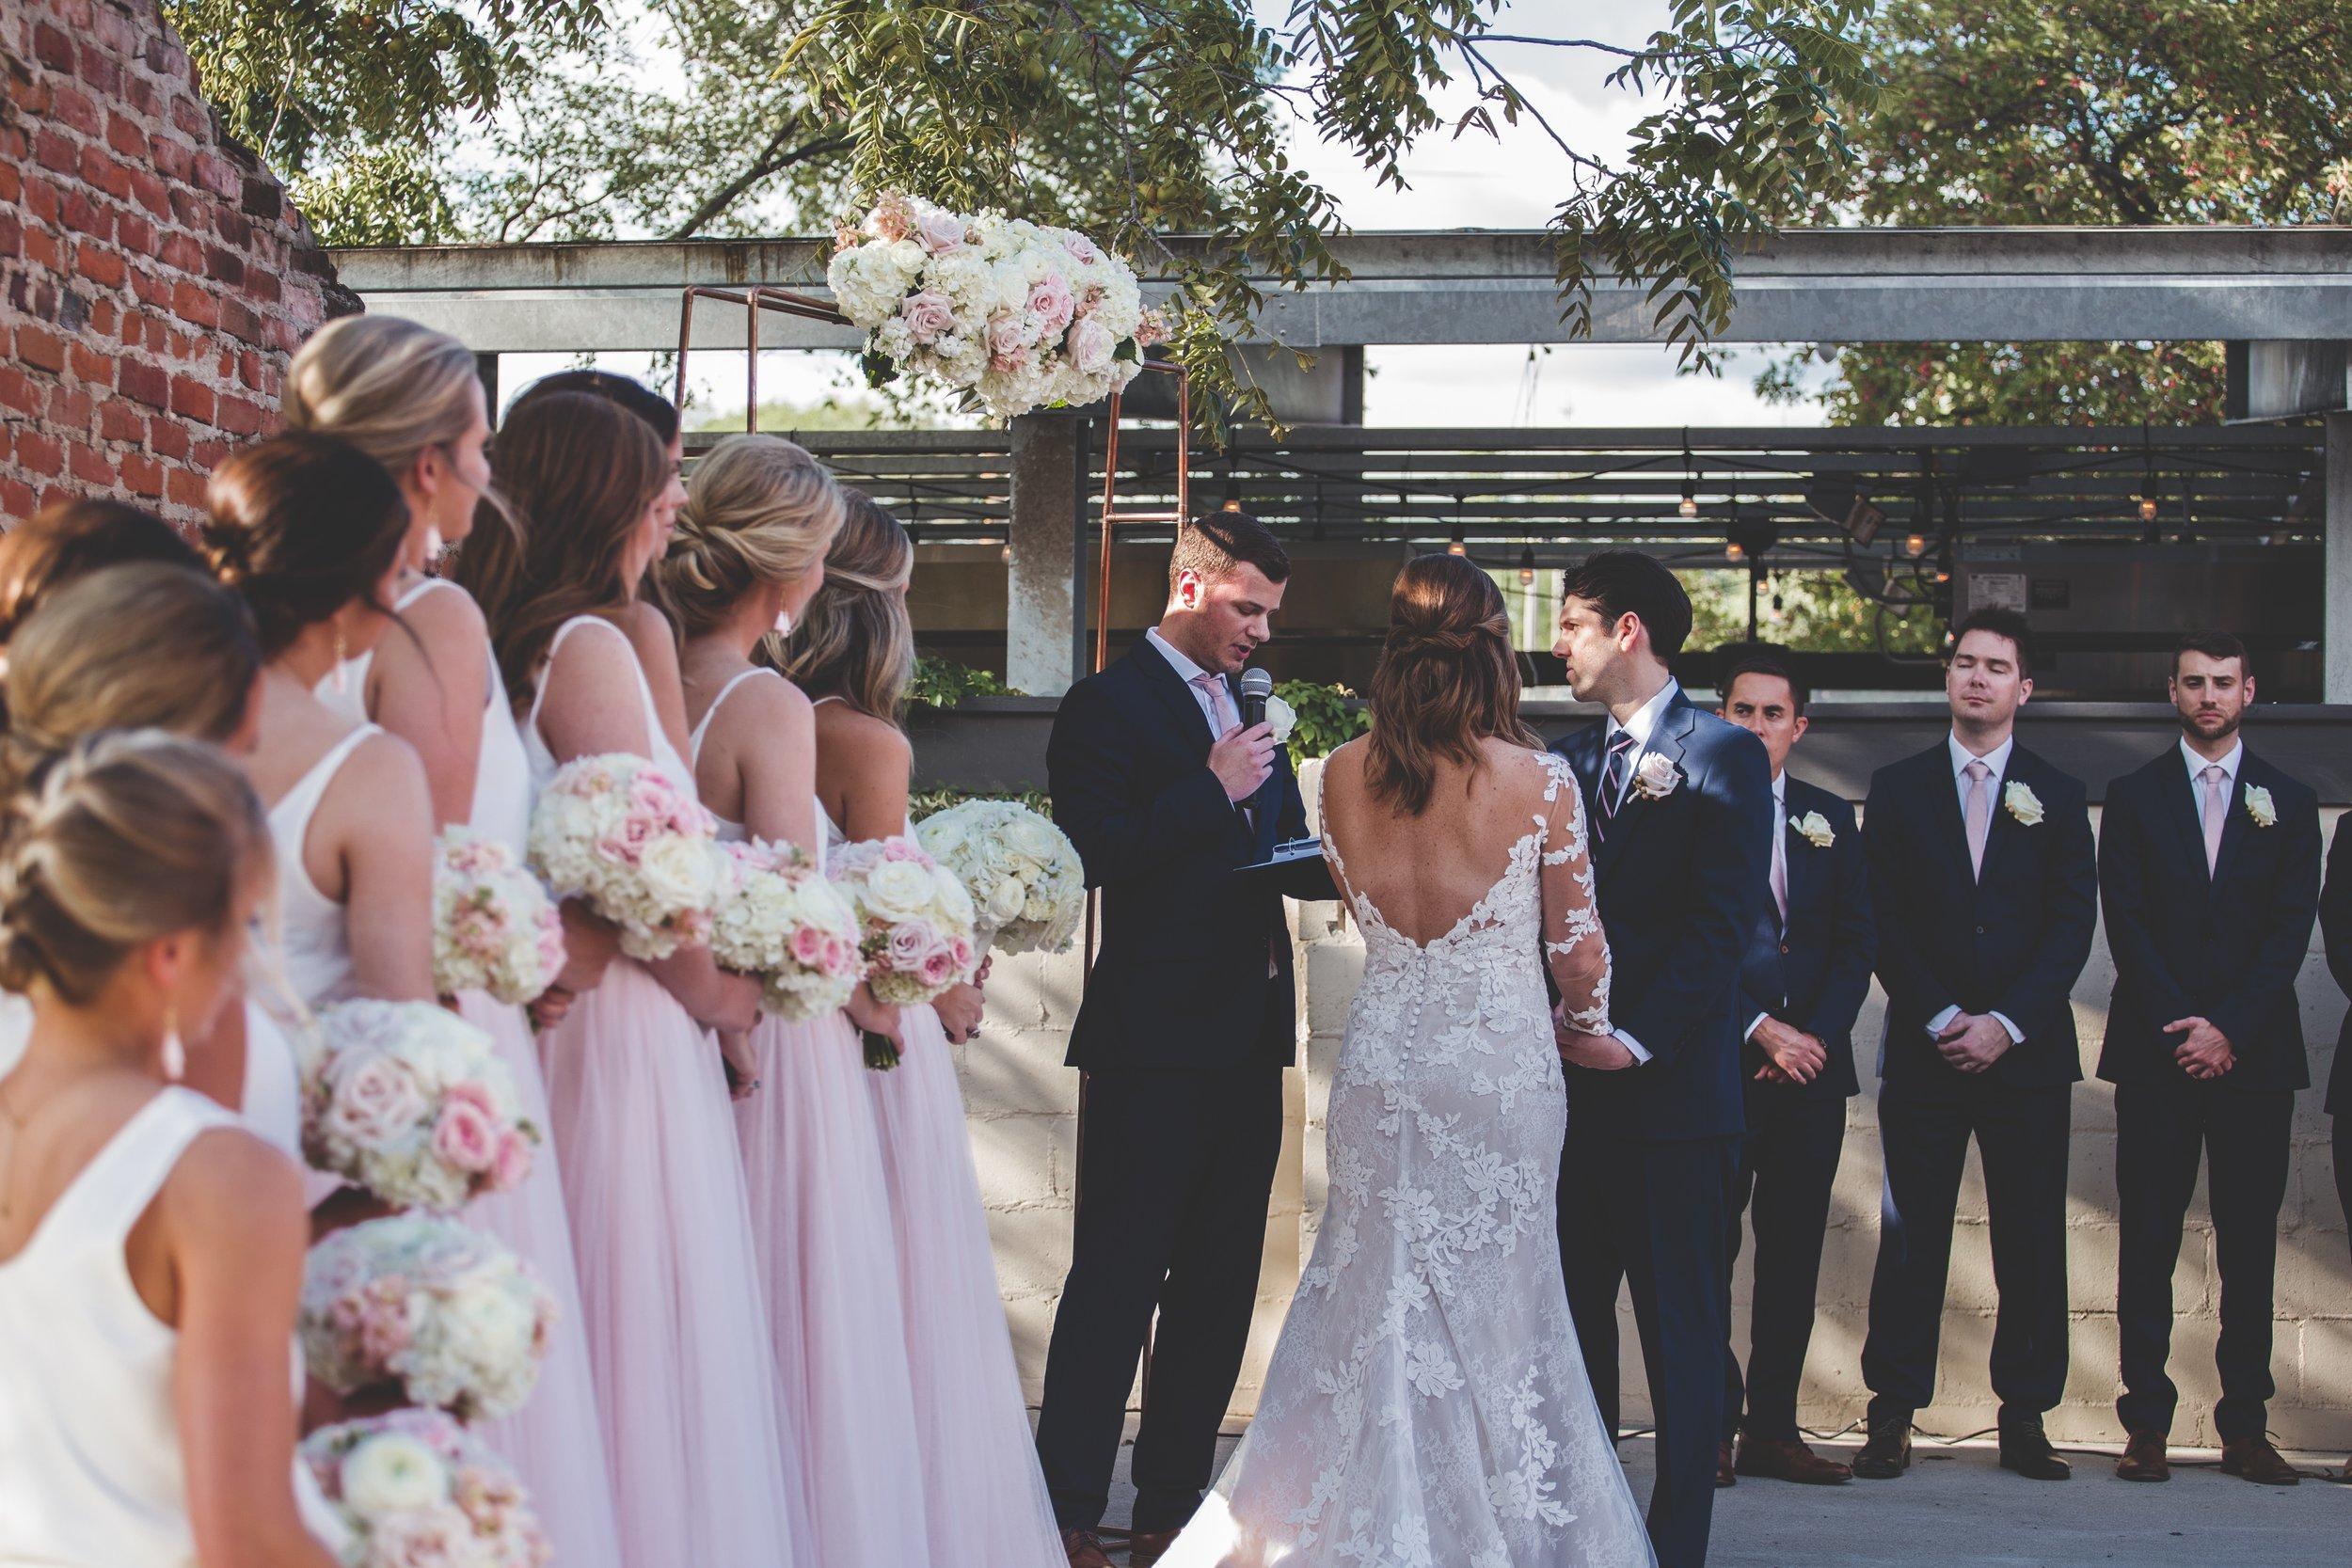 cider-gallery-lawrence-ks-wedding-photographer-jason-domingues-photography-lindsey-paul-0381.jpg